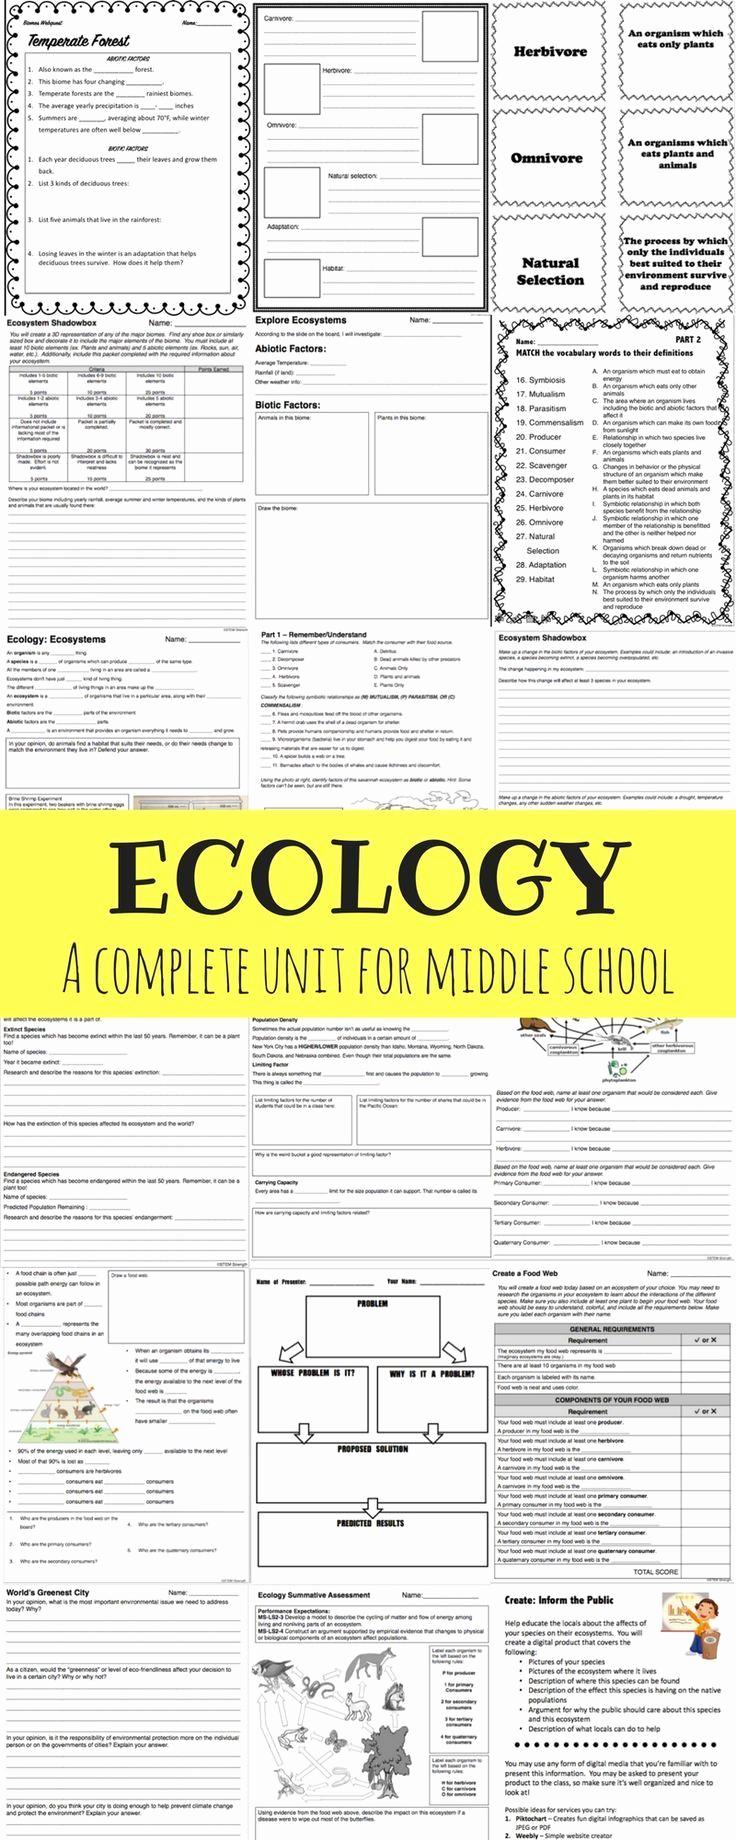 Ecology Worksheets Middle School Unique Ecology Full Unit